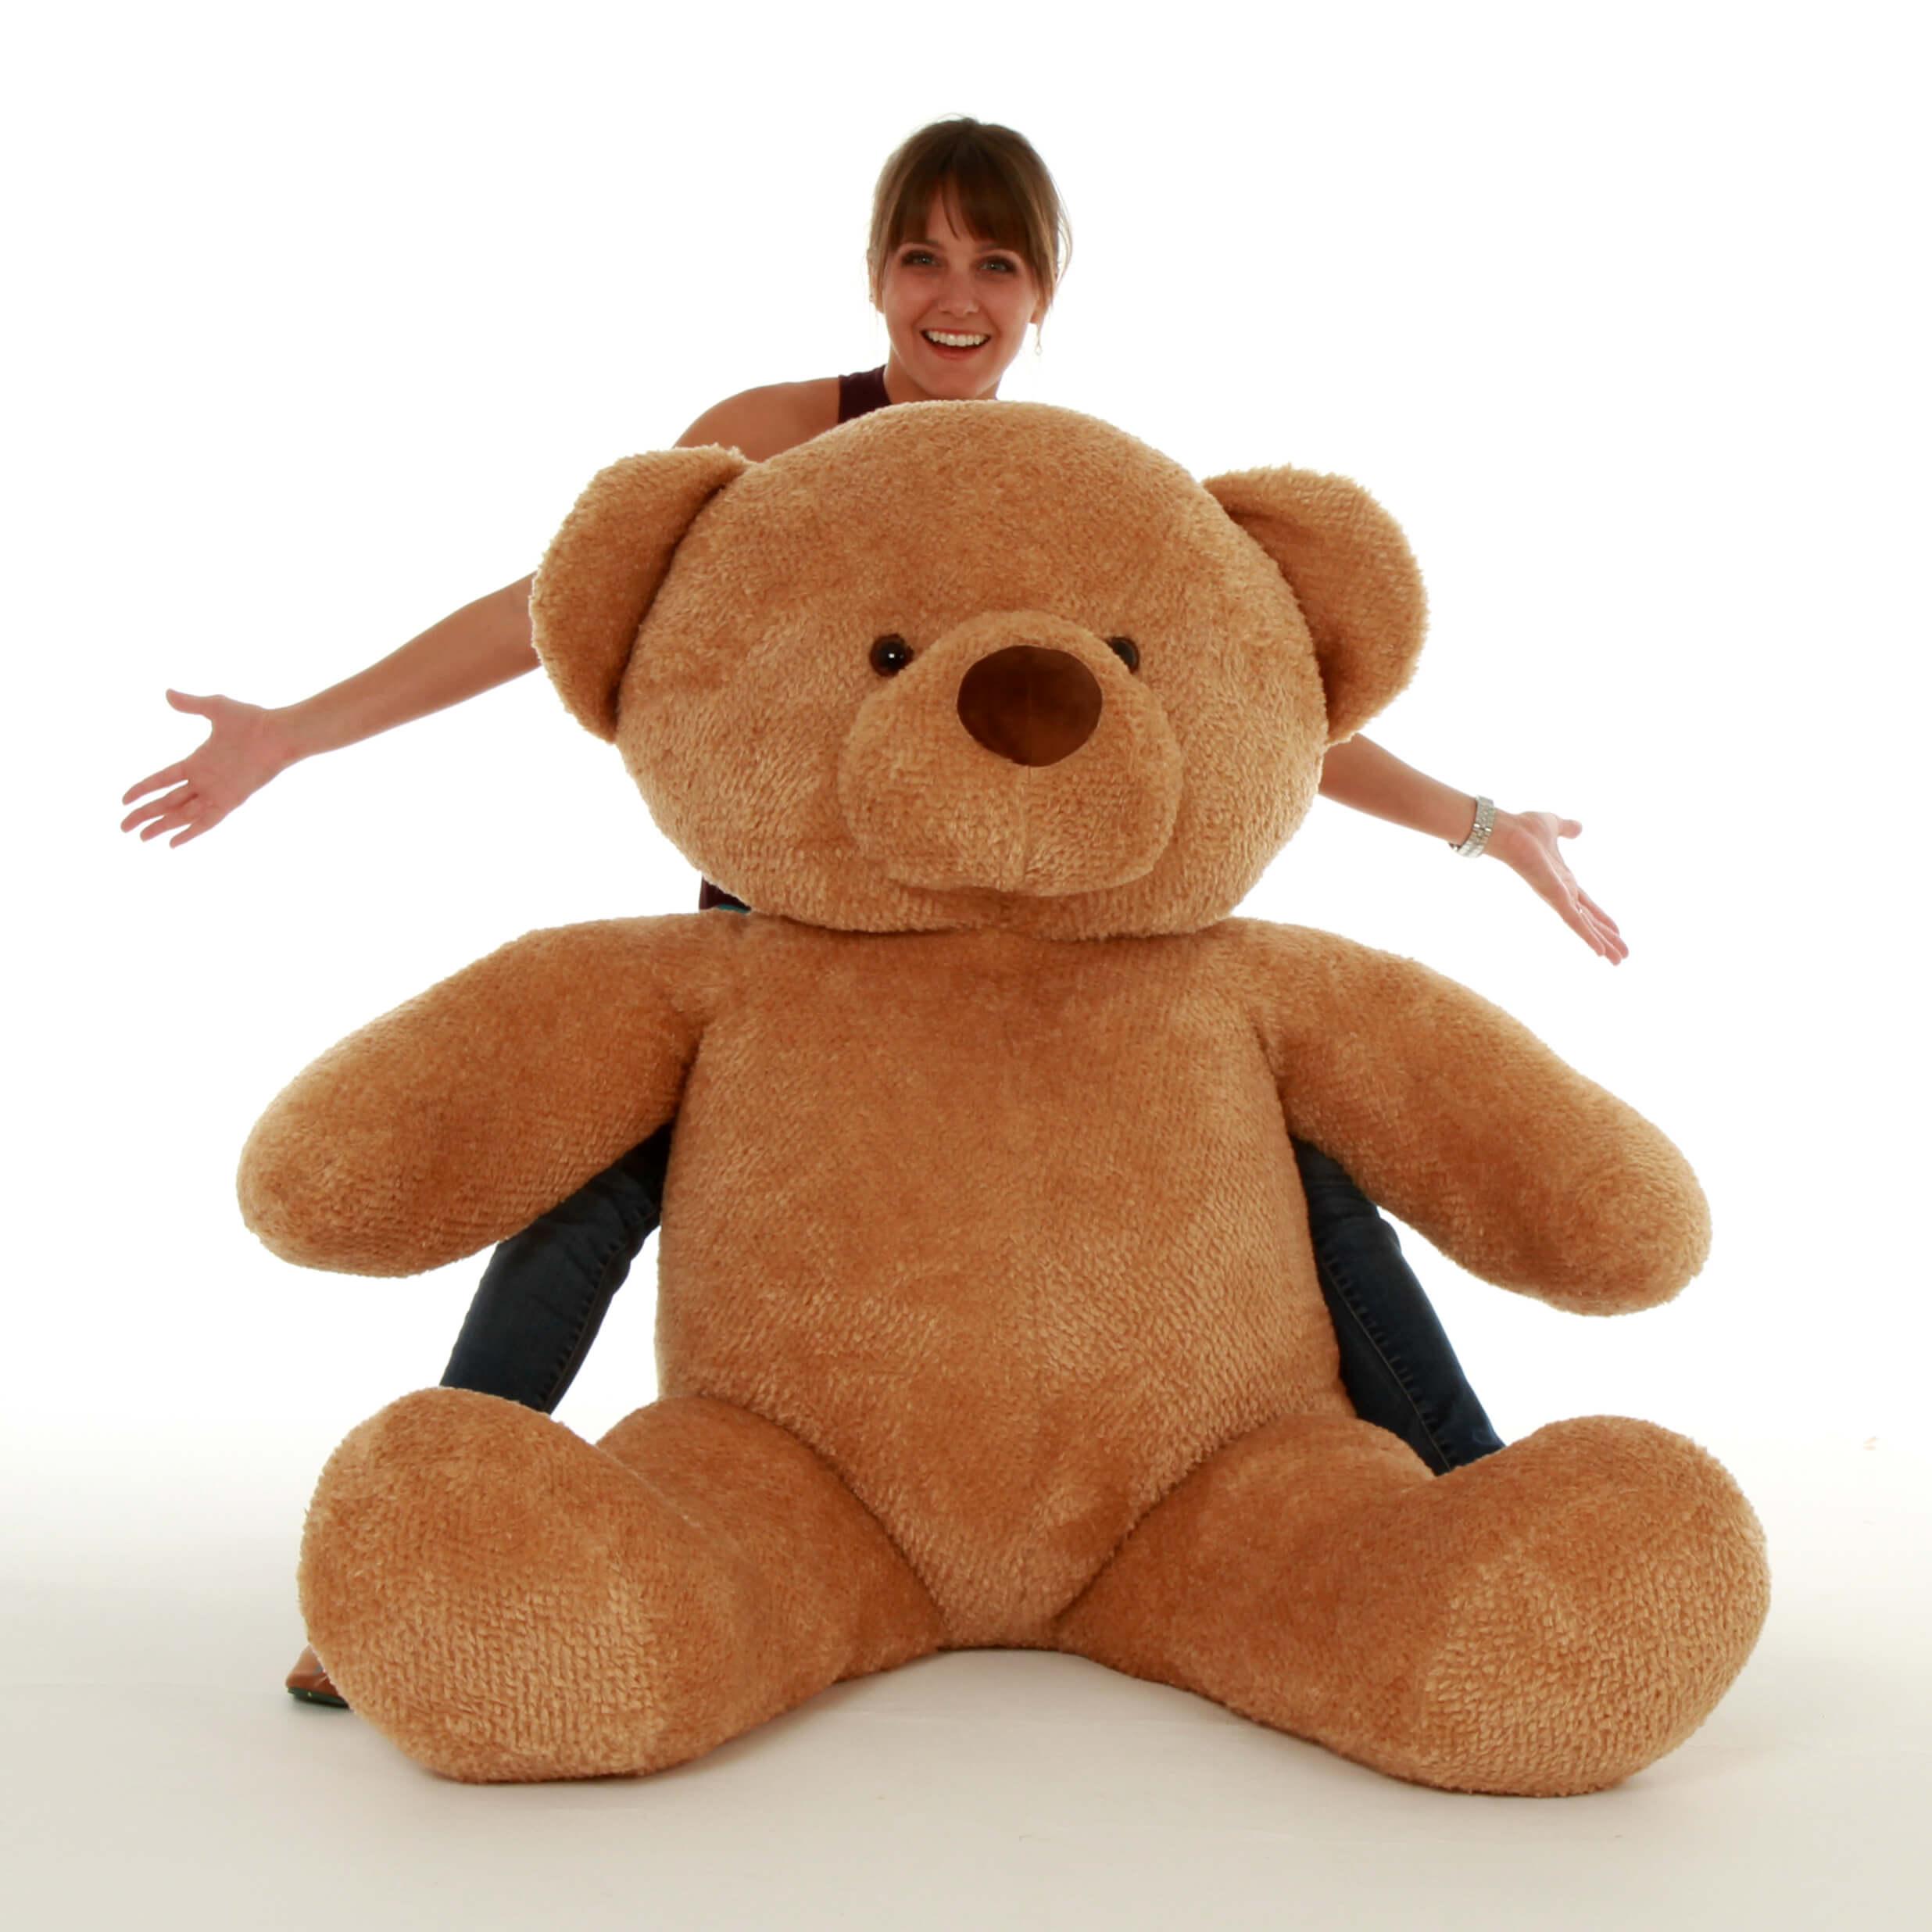 cutie-chubs-is-an-amber-giant-stuffed-animal-teddy-bear-that-measures-55-1.jpg